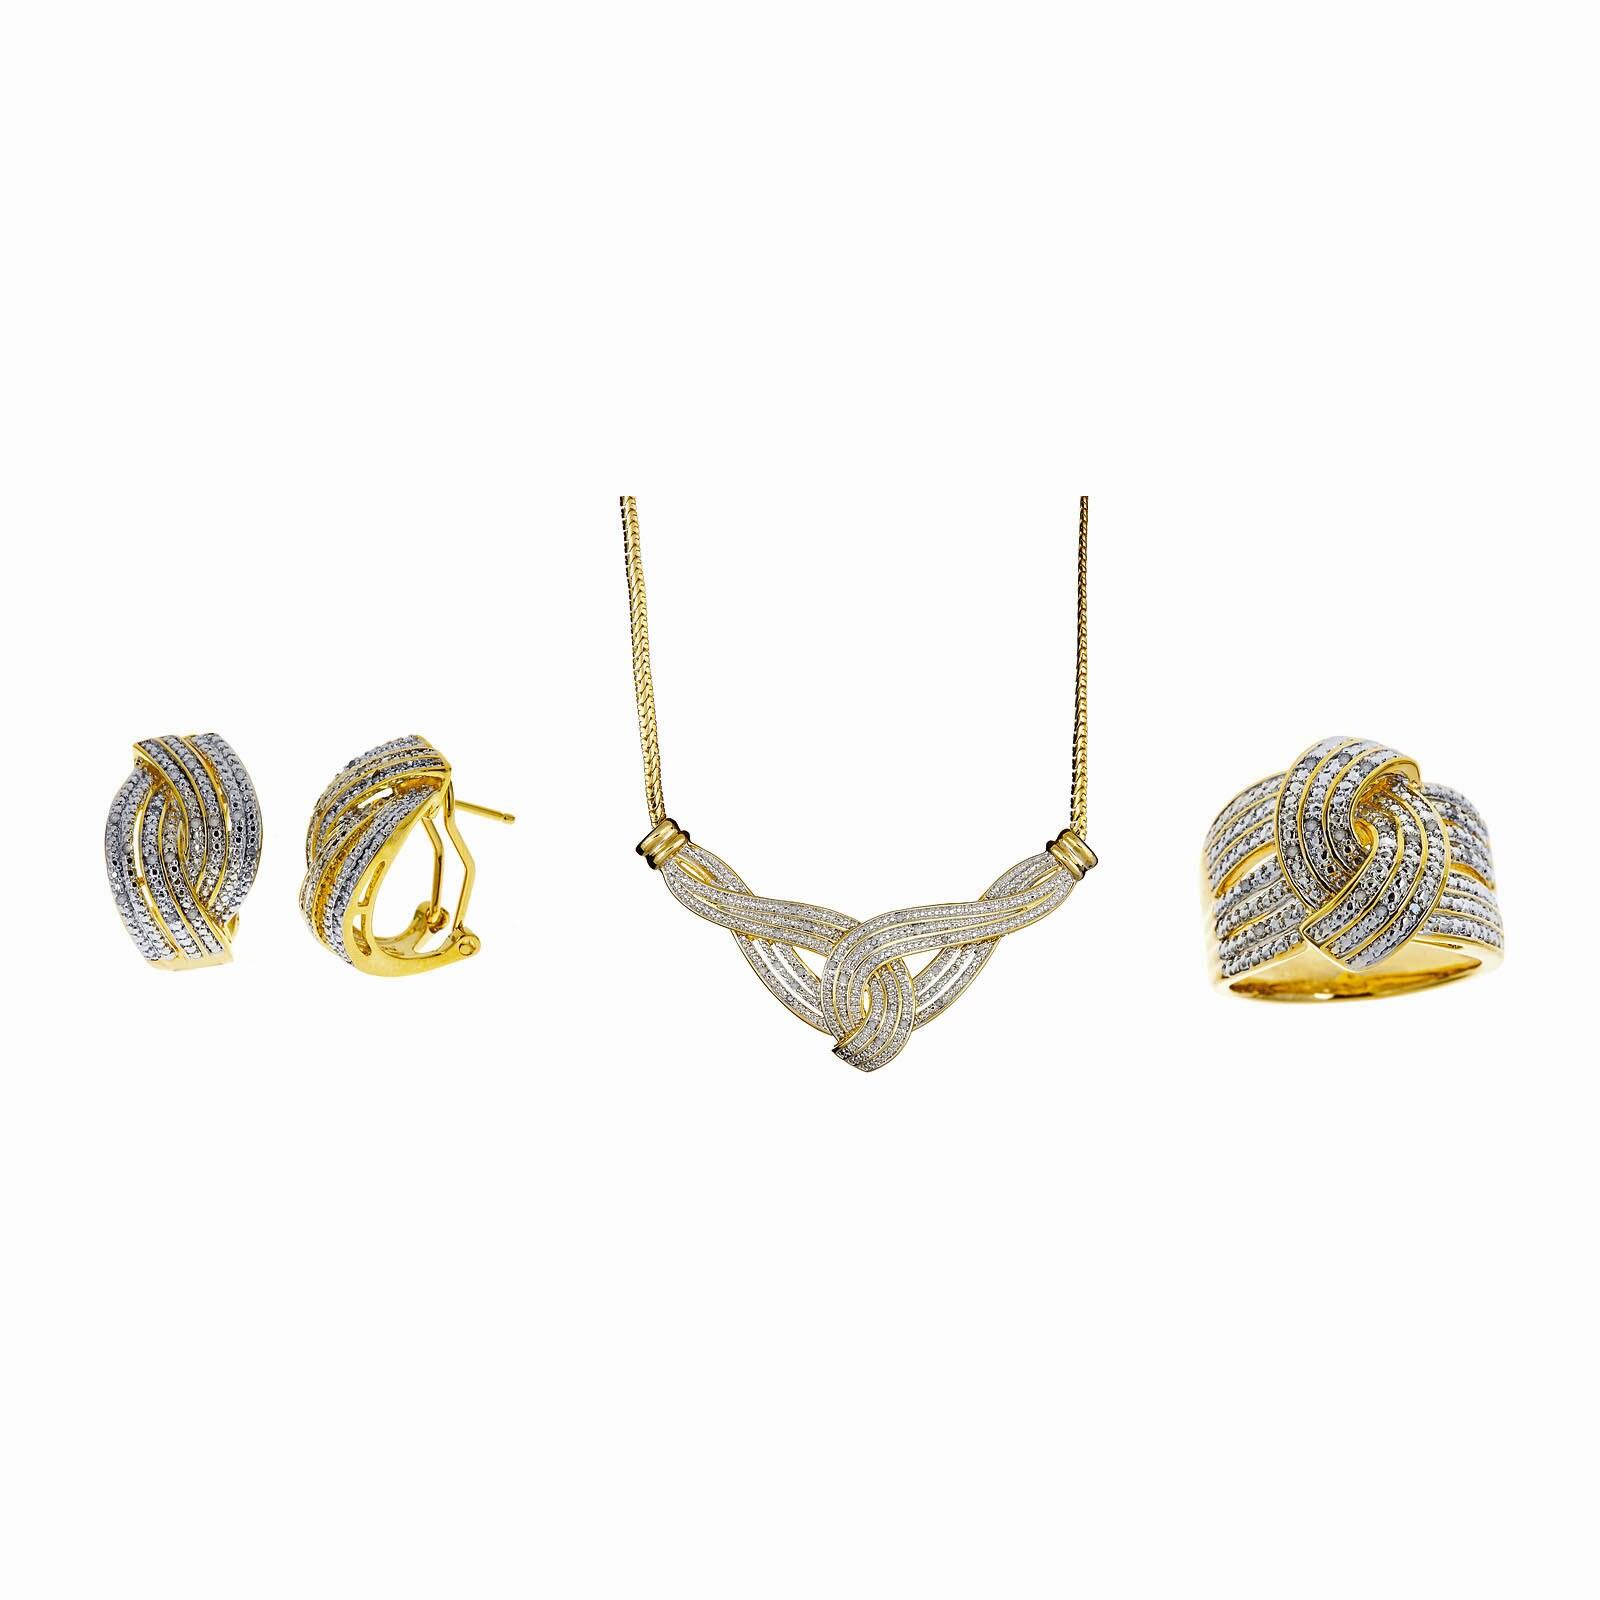 Divina 14k Gold Overlay 1/2ct TDW Diamond 3-piece Jewelry...